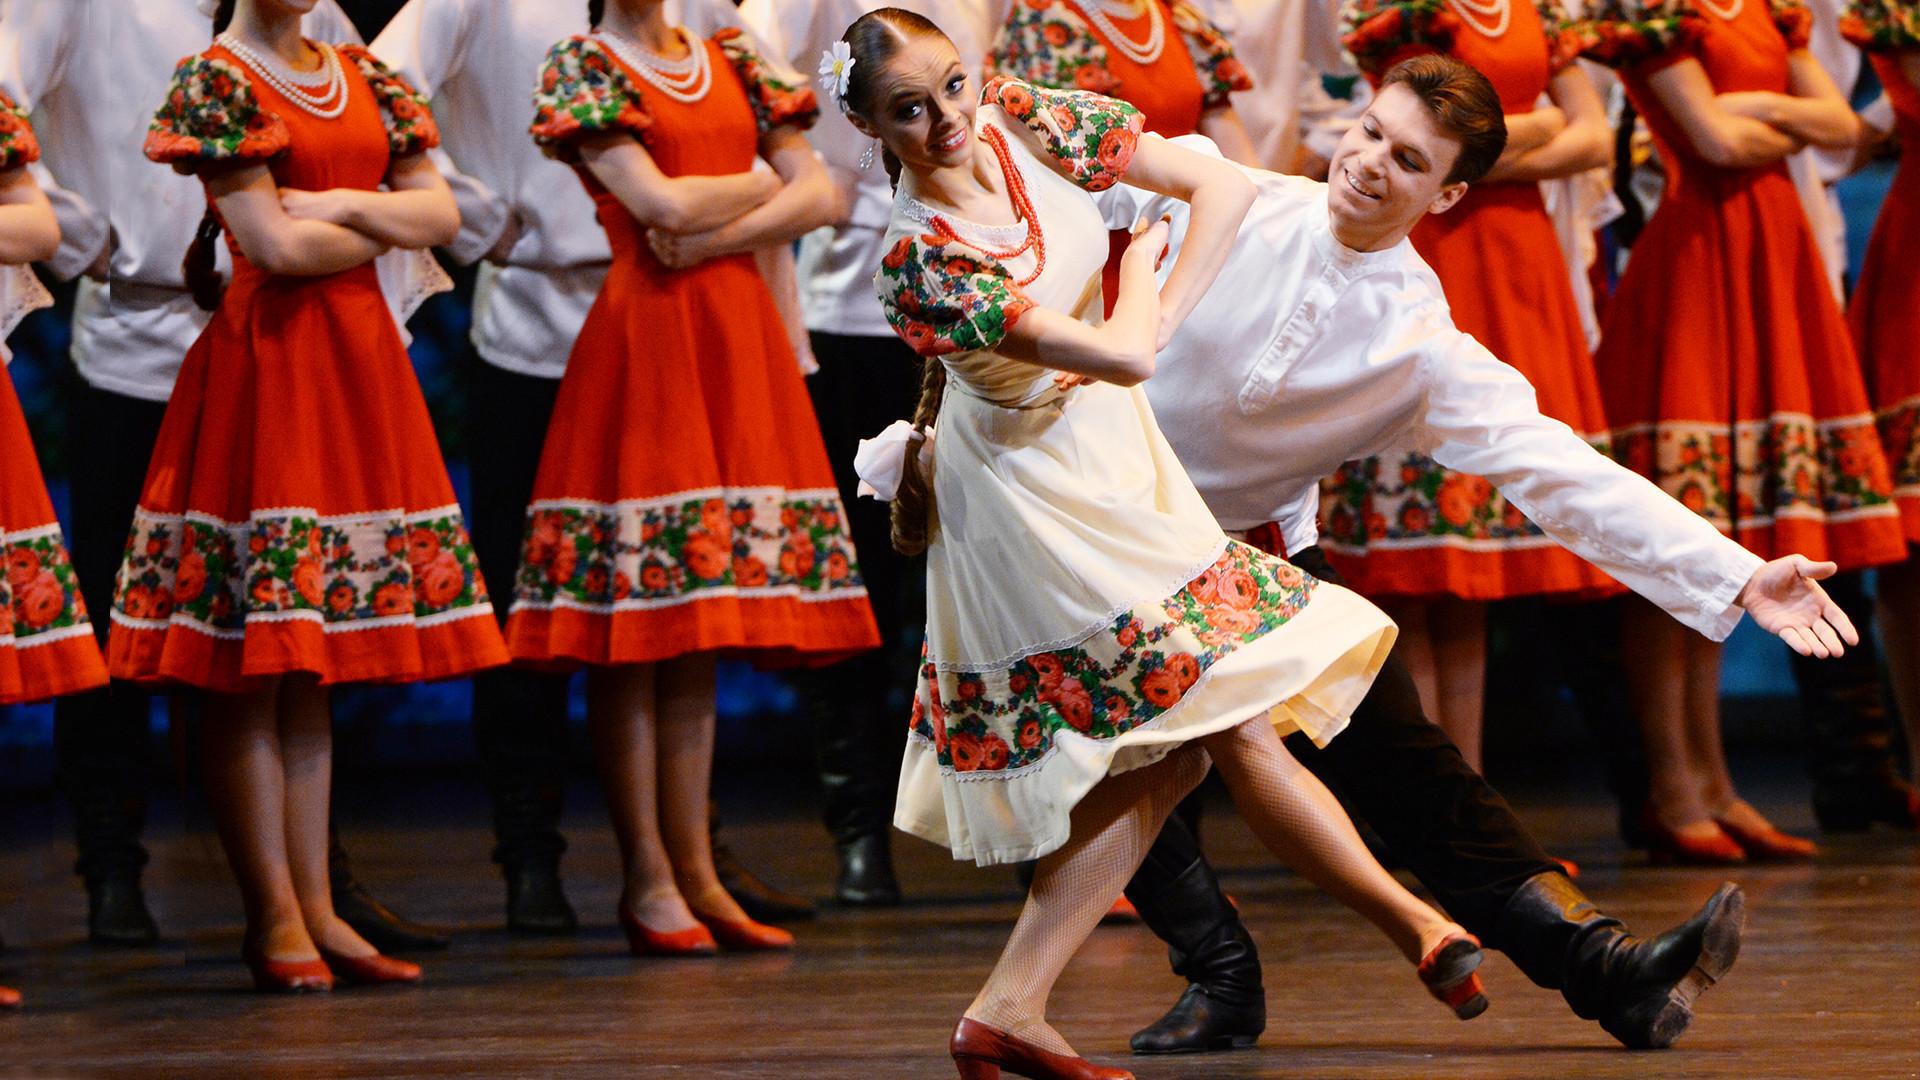 'Summer' Russian folk dance by artists of the Igor Moiseyev ballet